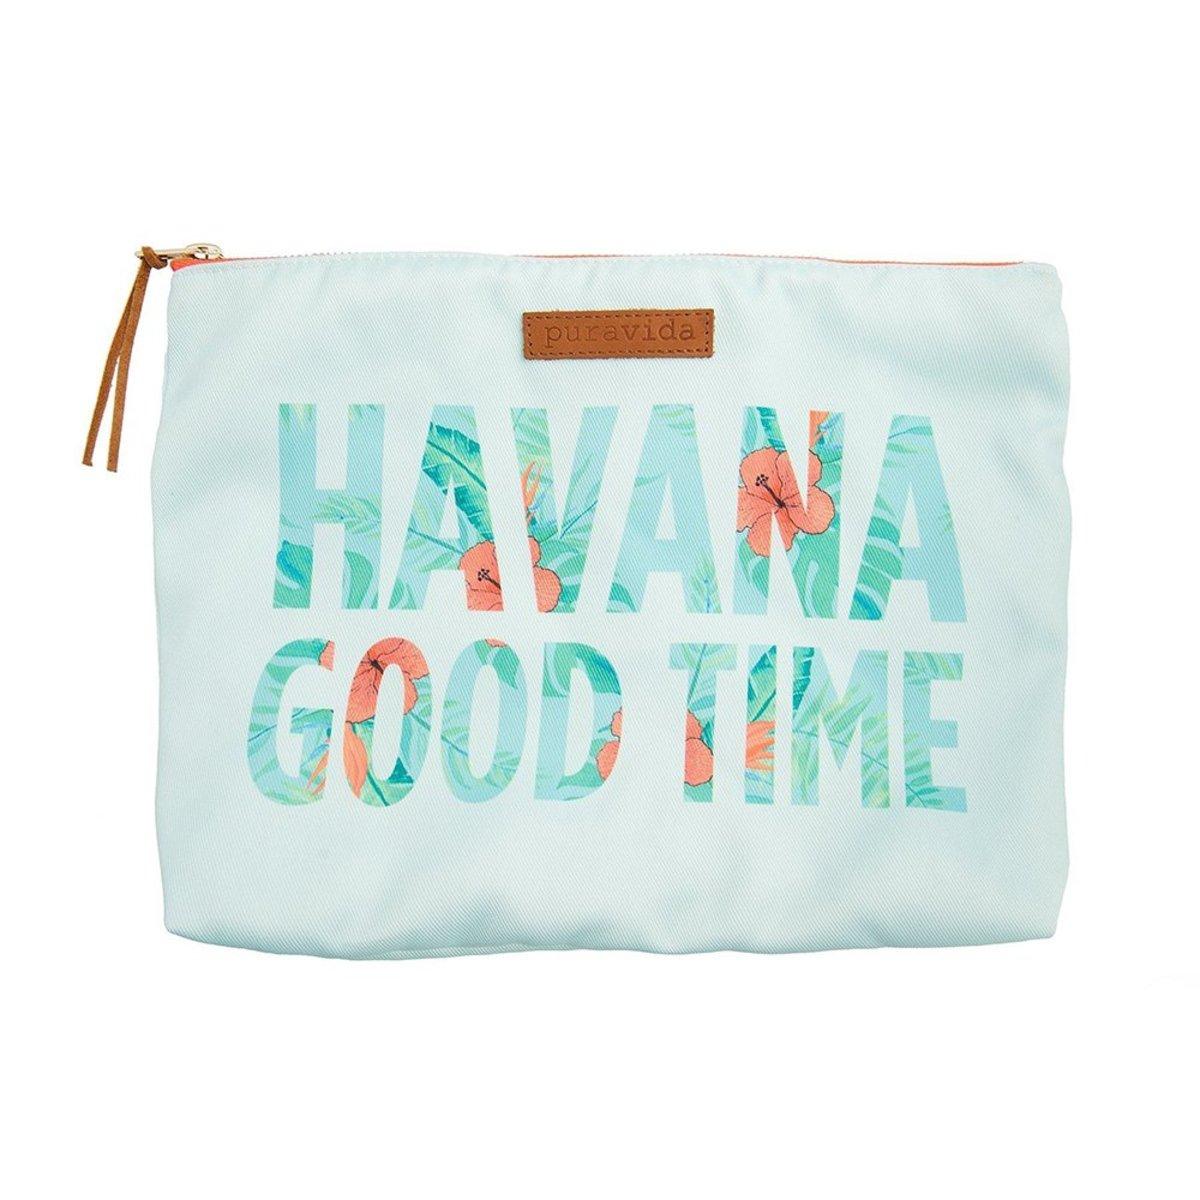 Havana Good Time Clutch